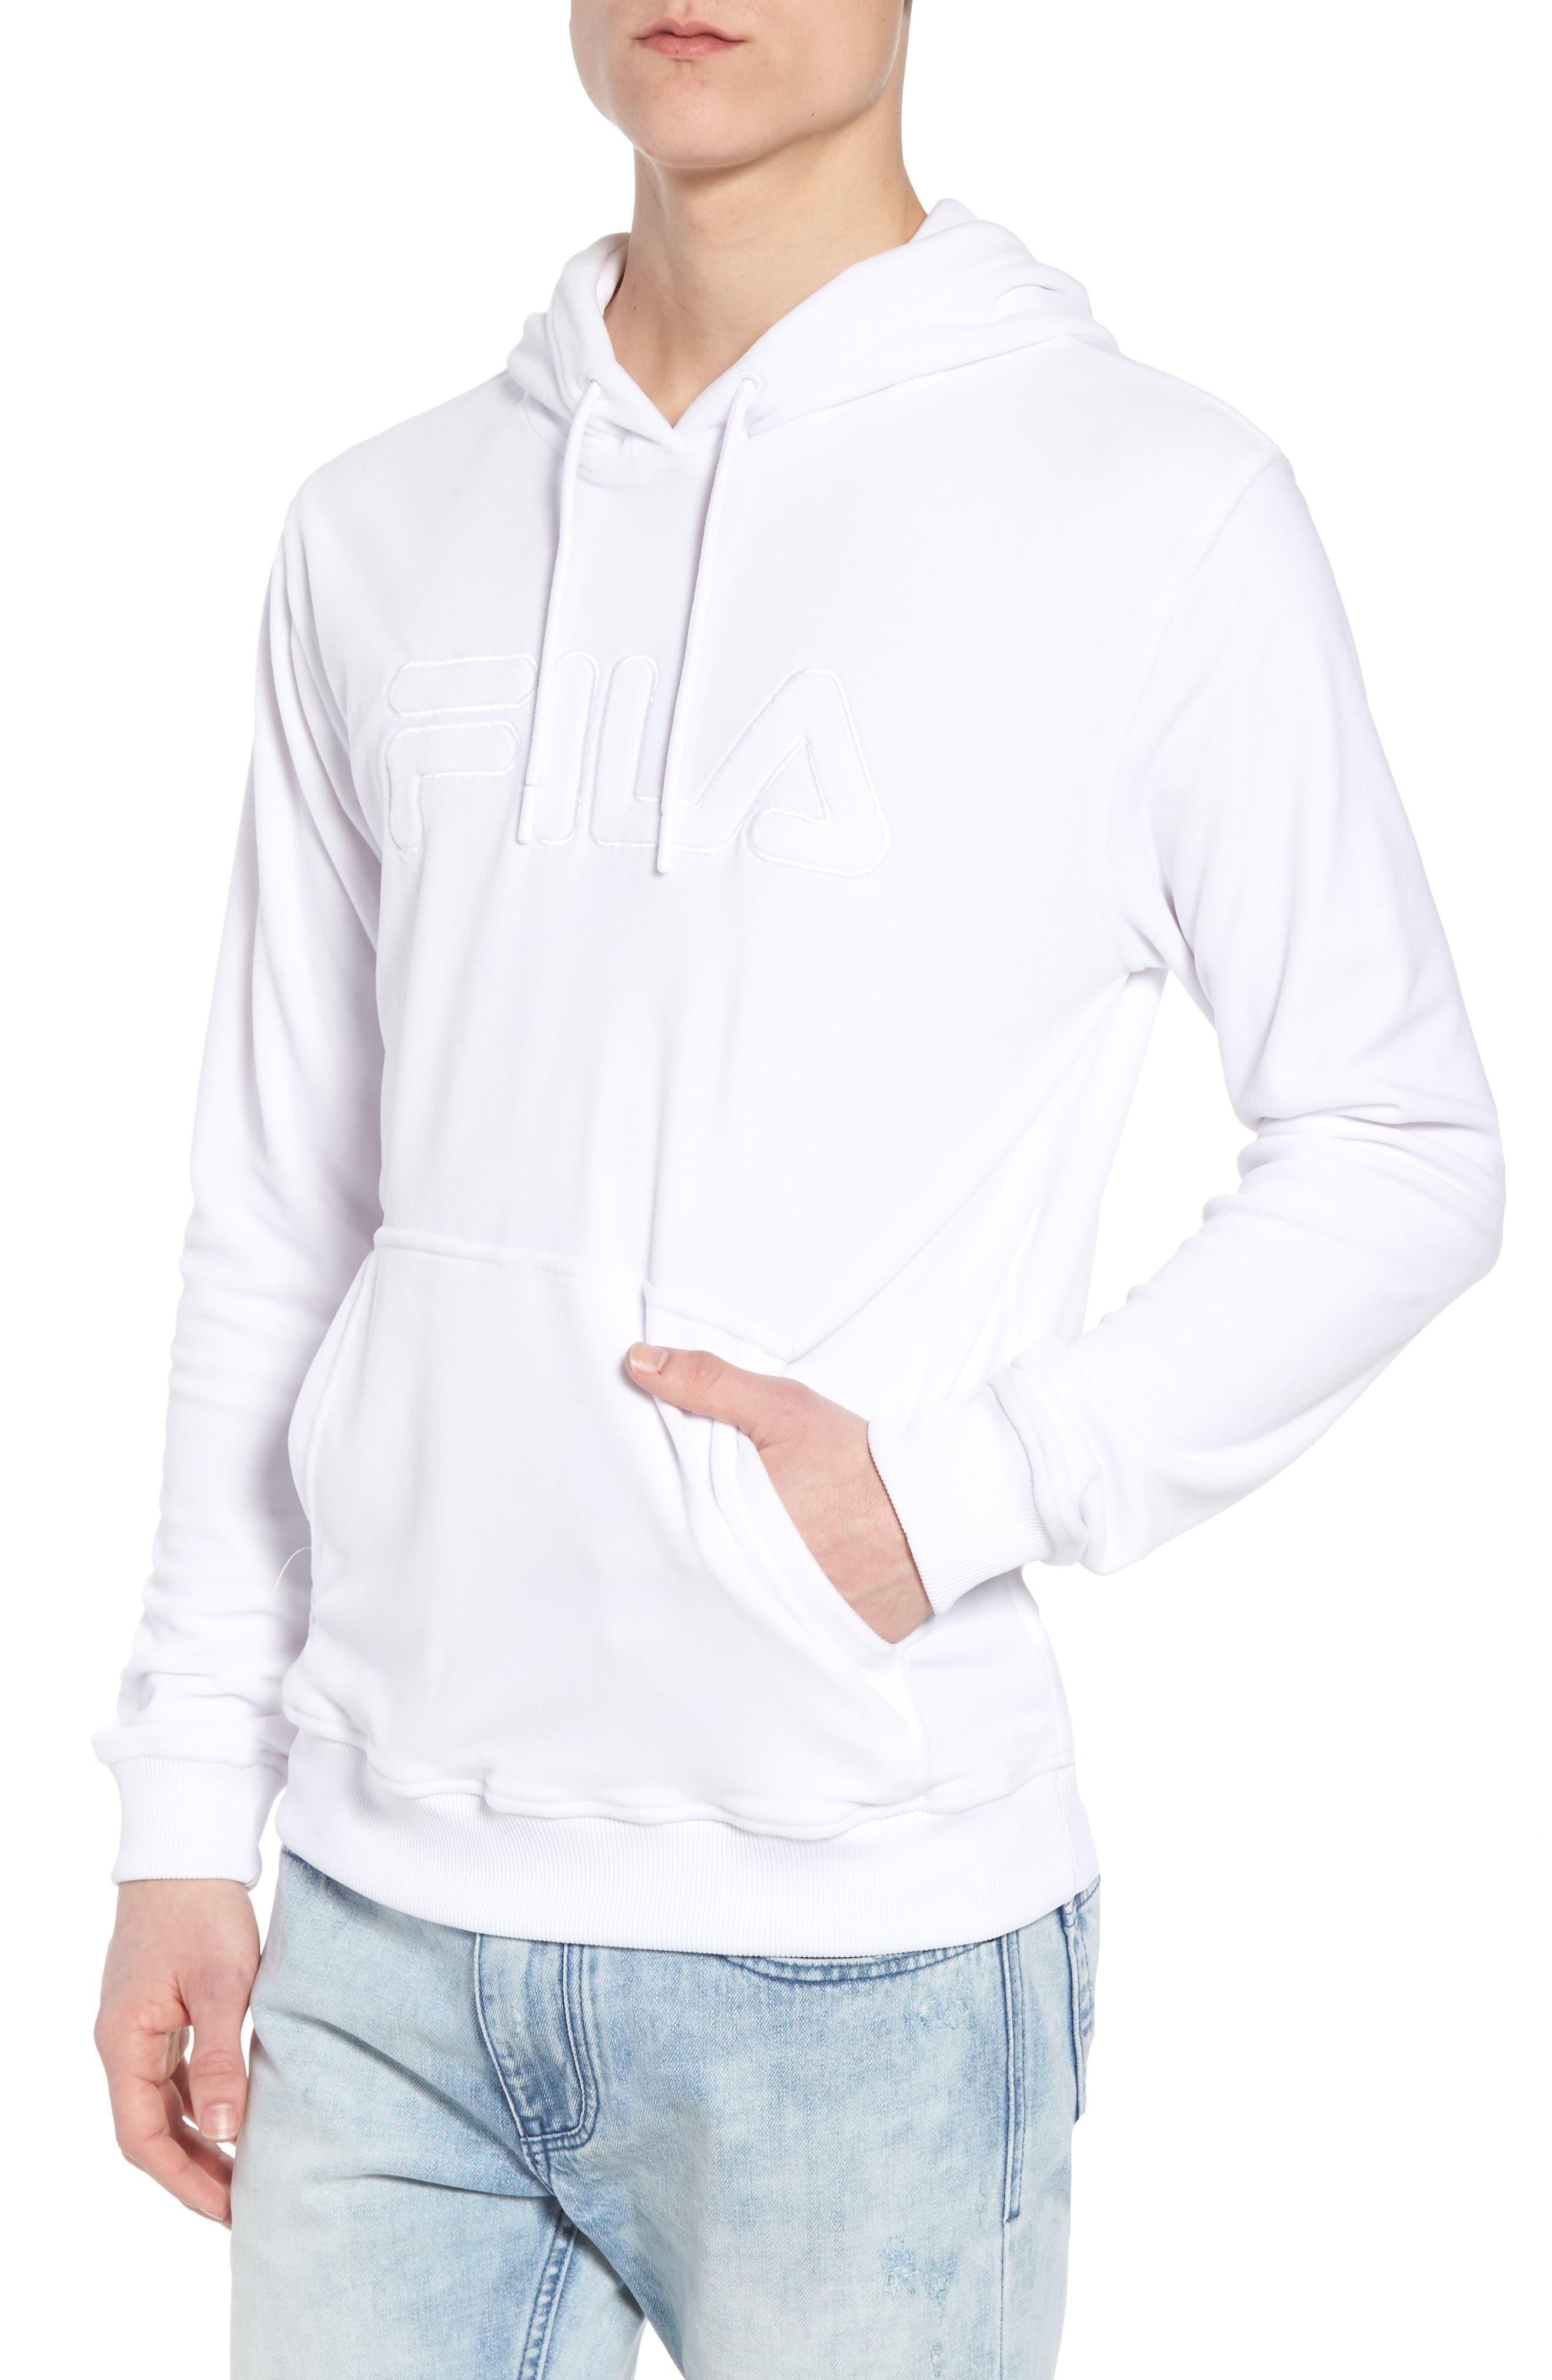 Asher Velour Hoodie Sweatshirt,                         Main,                         color, 100